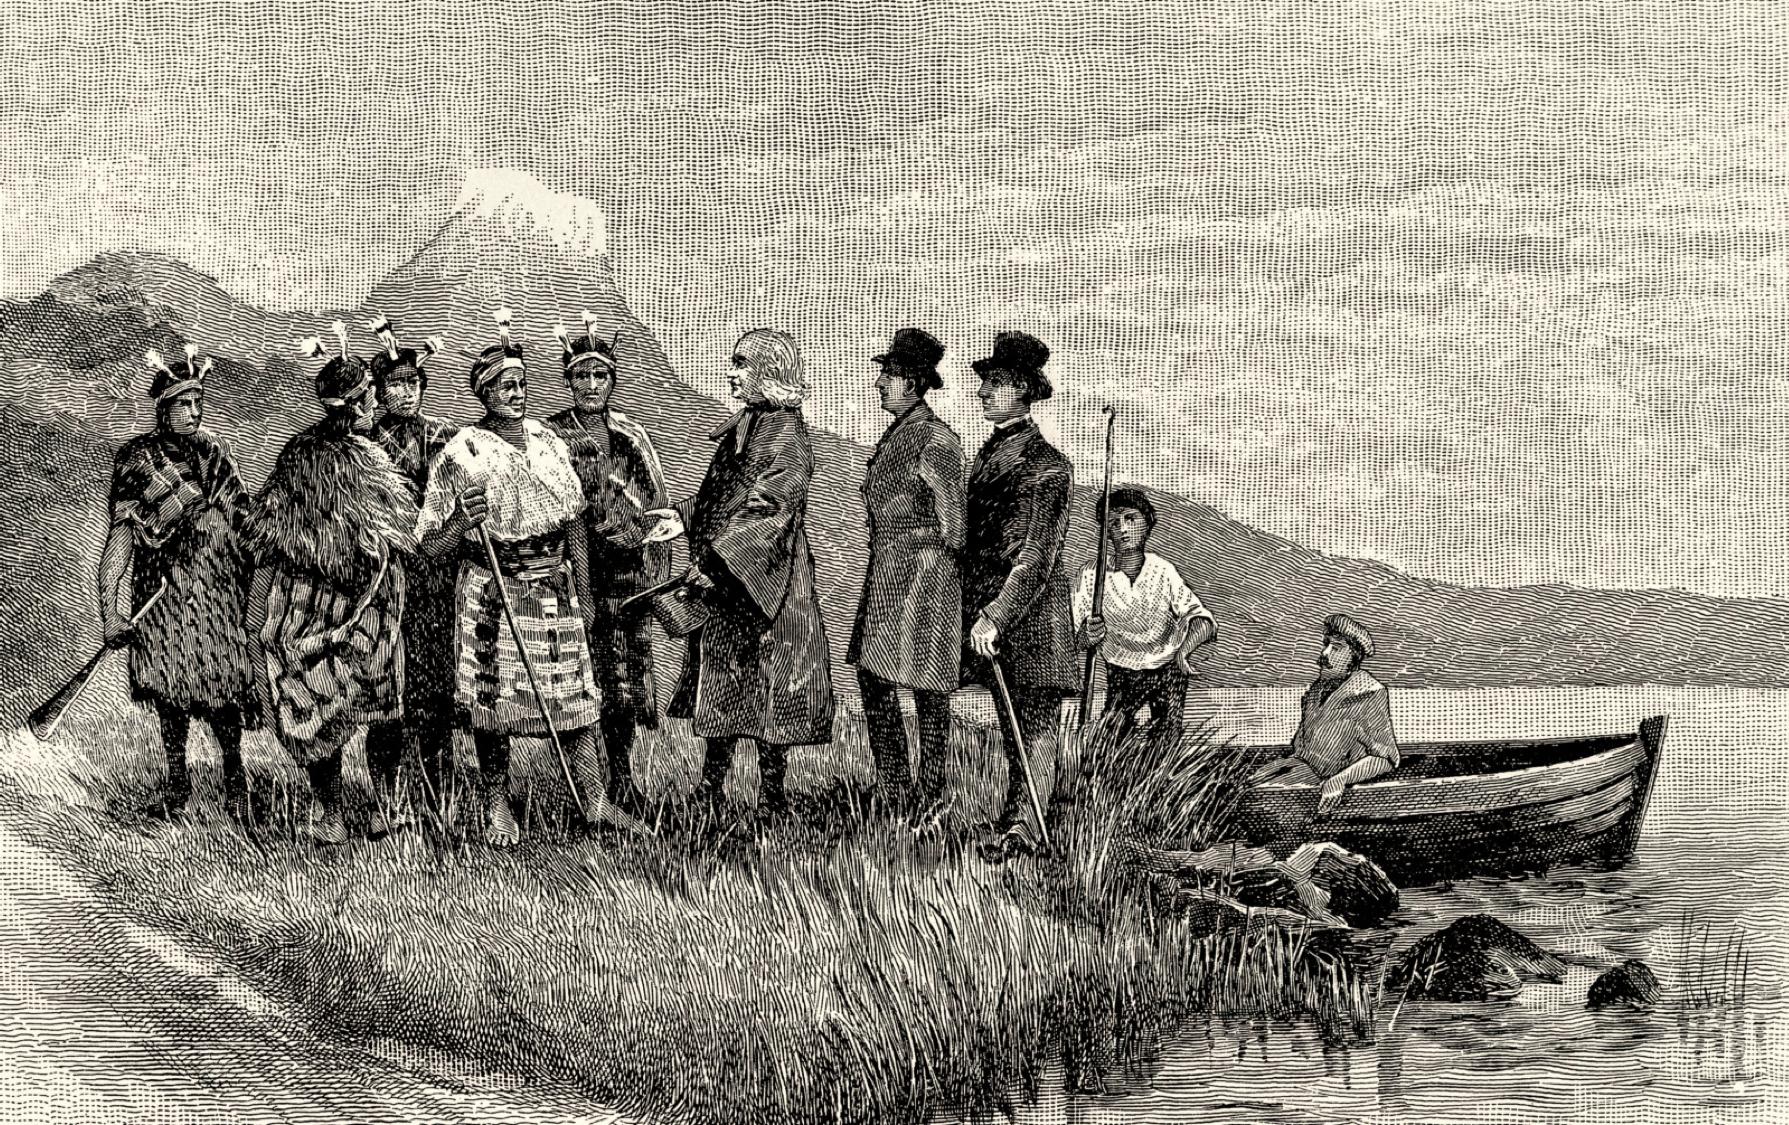 Reverend Samuel Marsden Landing, Bay of Islands, 1814. Ipipiri, Landing, Whangaroa, Aotearoa, New Zealand, missionary, Christianity, St. John's Cemetery Project, Old Parramattans